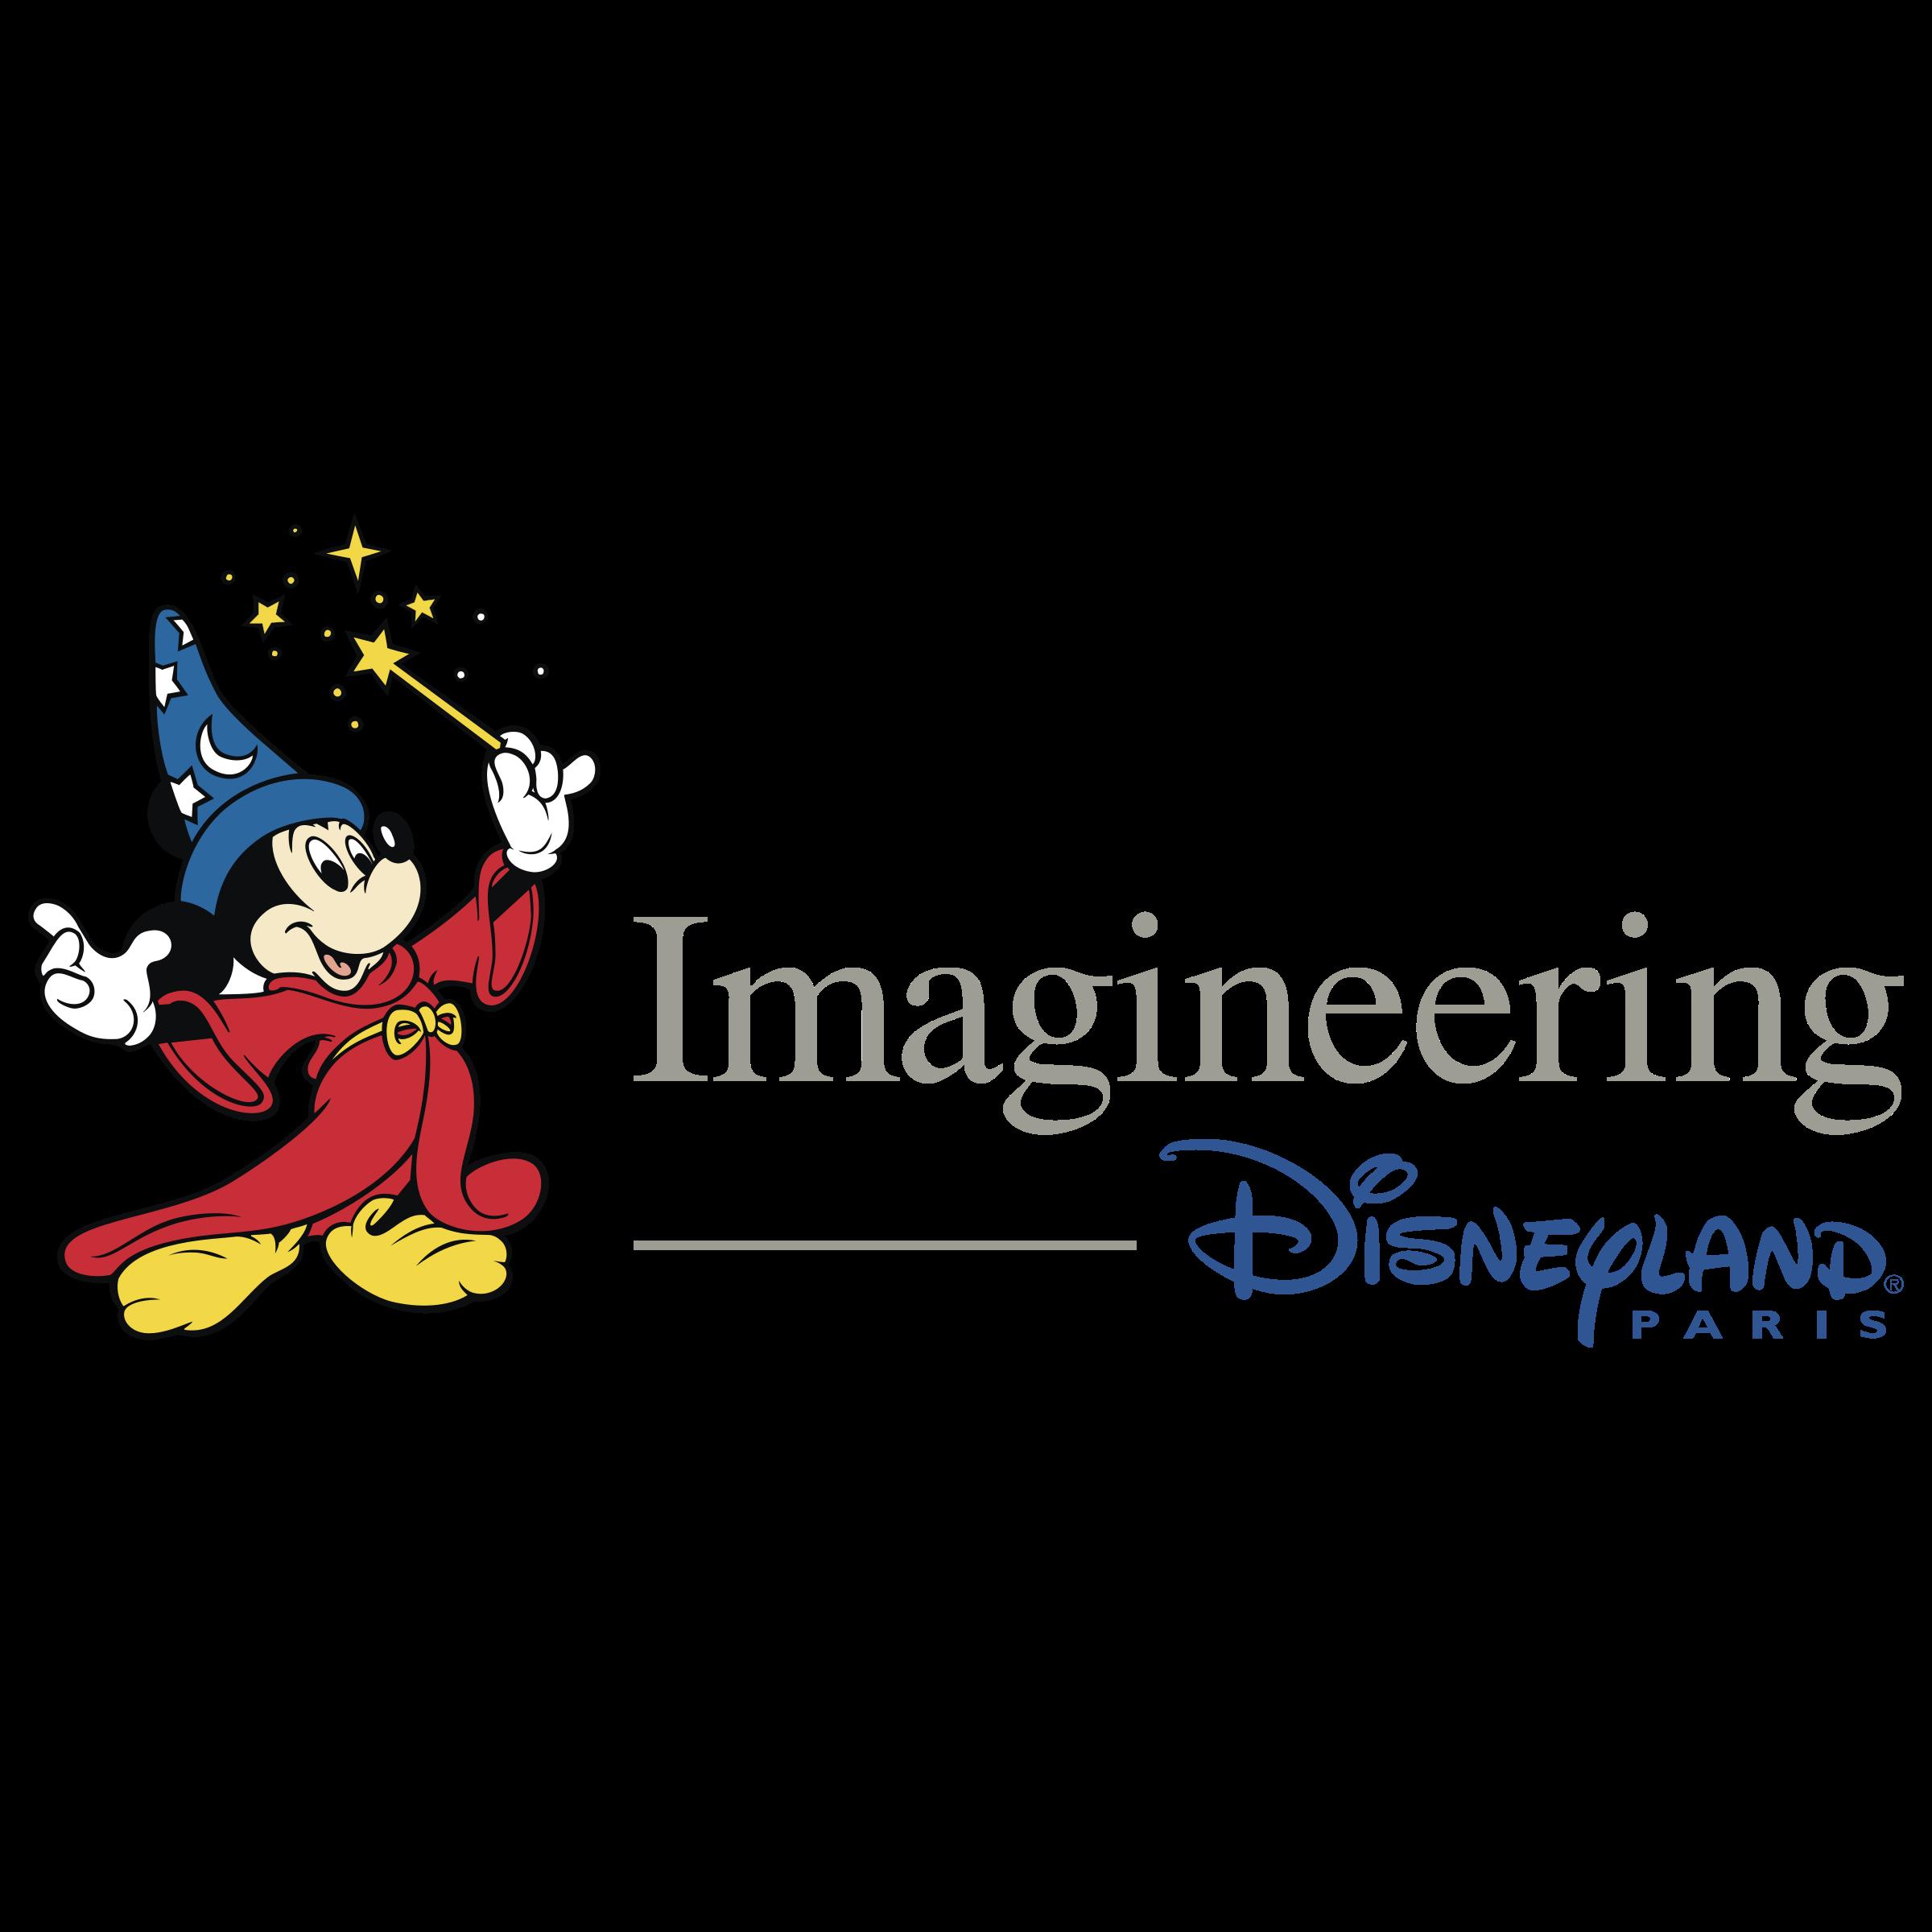 Imagineering paris logo png. Disneyland clipart vector